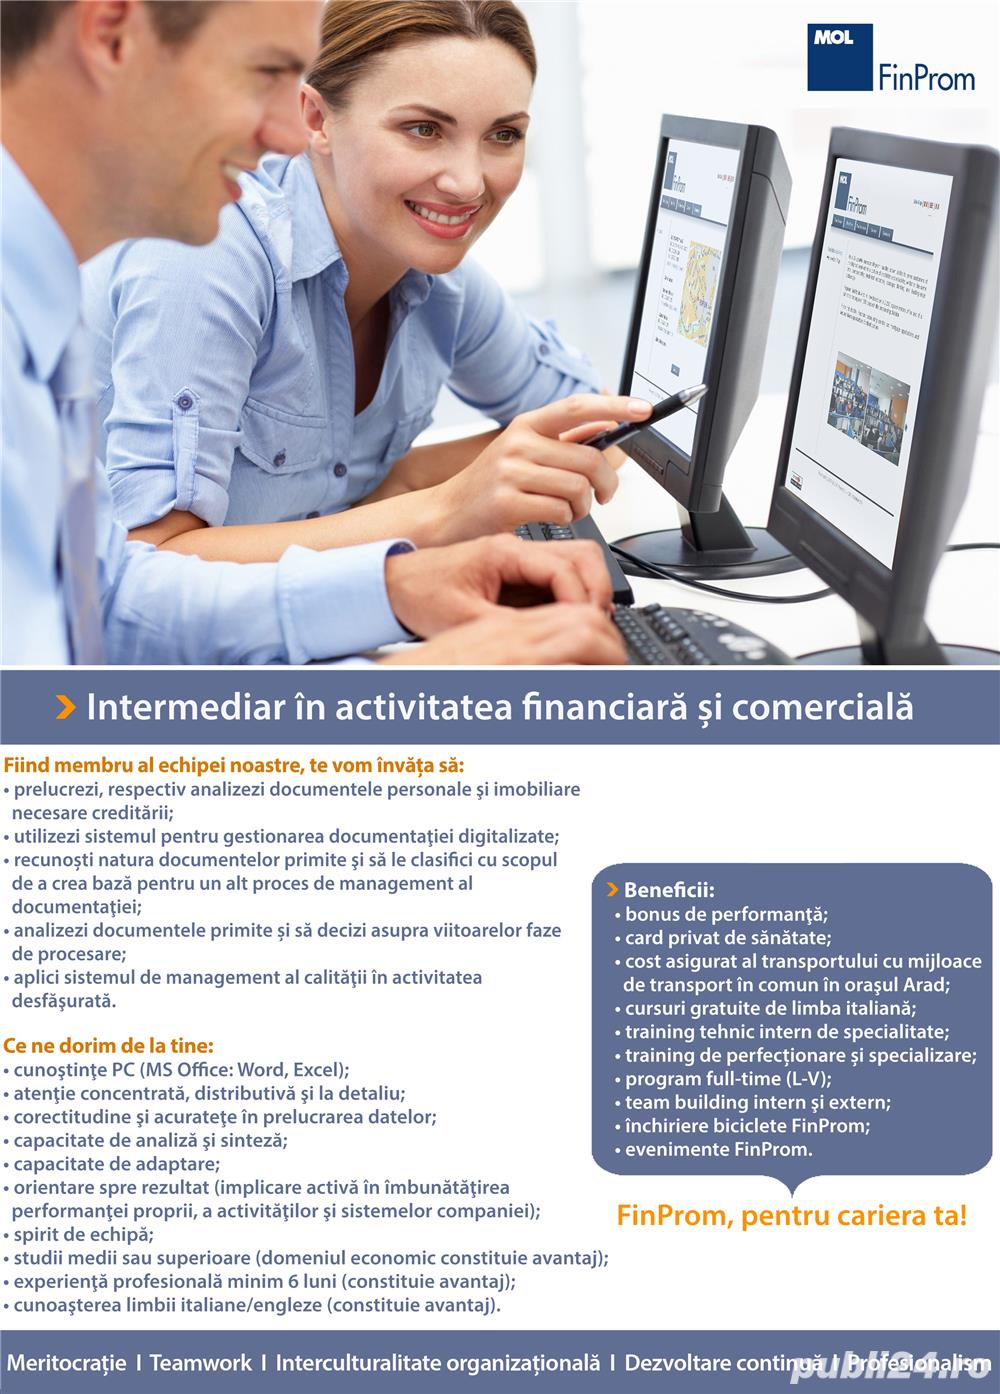 Intermediar in activitatea financiara